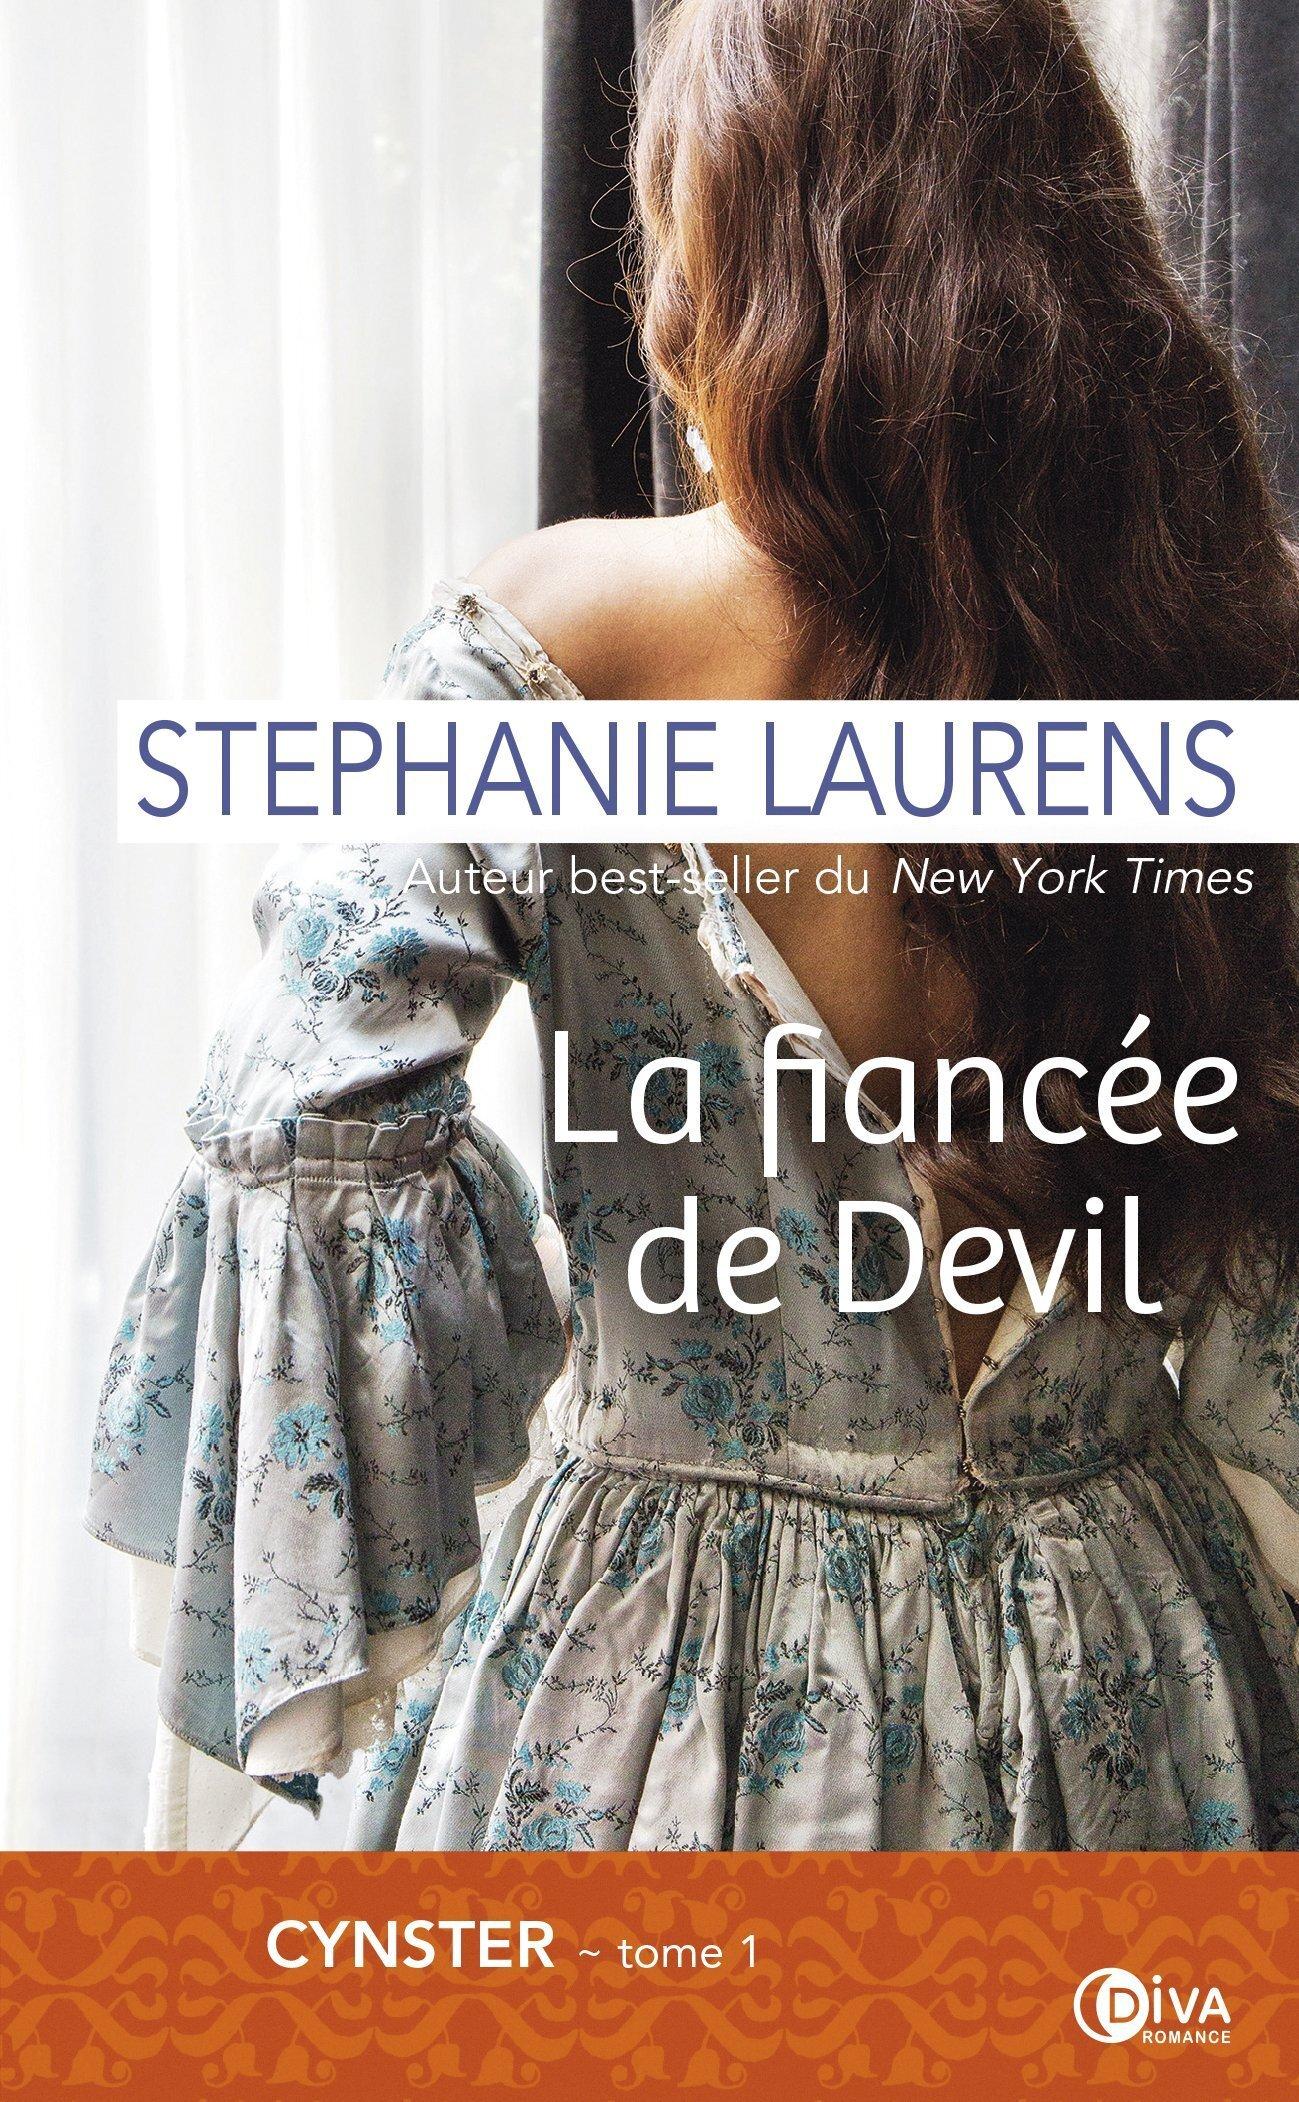 cdn1.booknode.com/book_cover/800/full/cynster-tome-1-la-fiancee-de-devil-799958.jpg